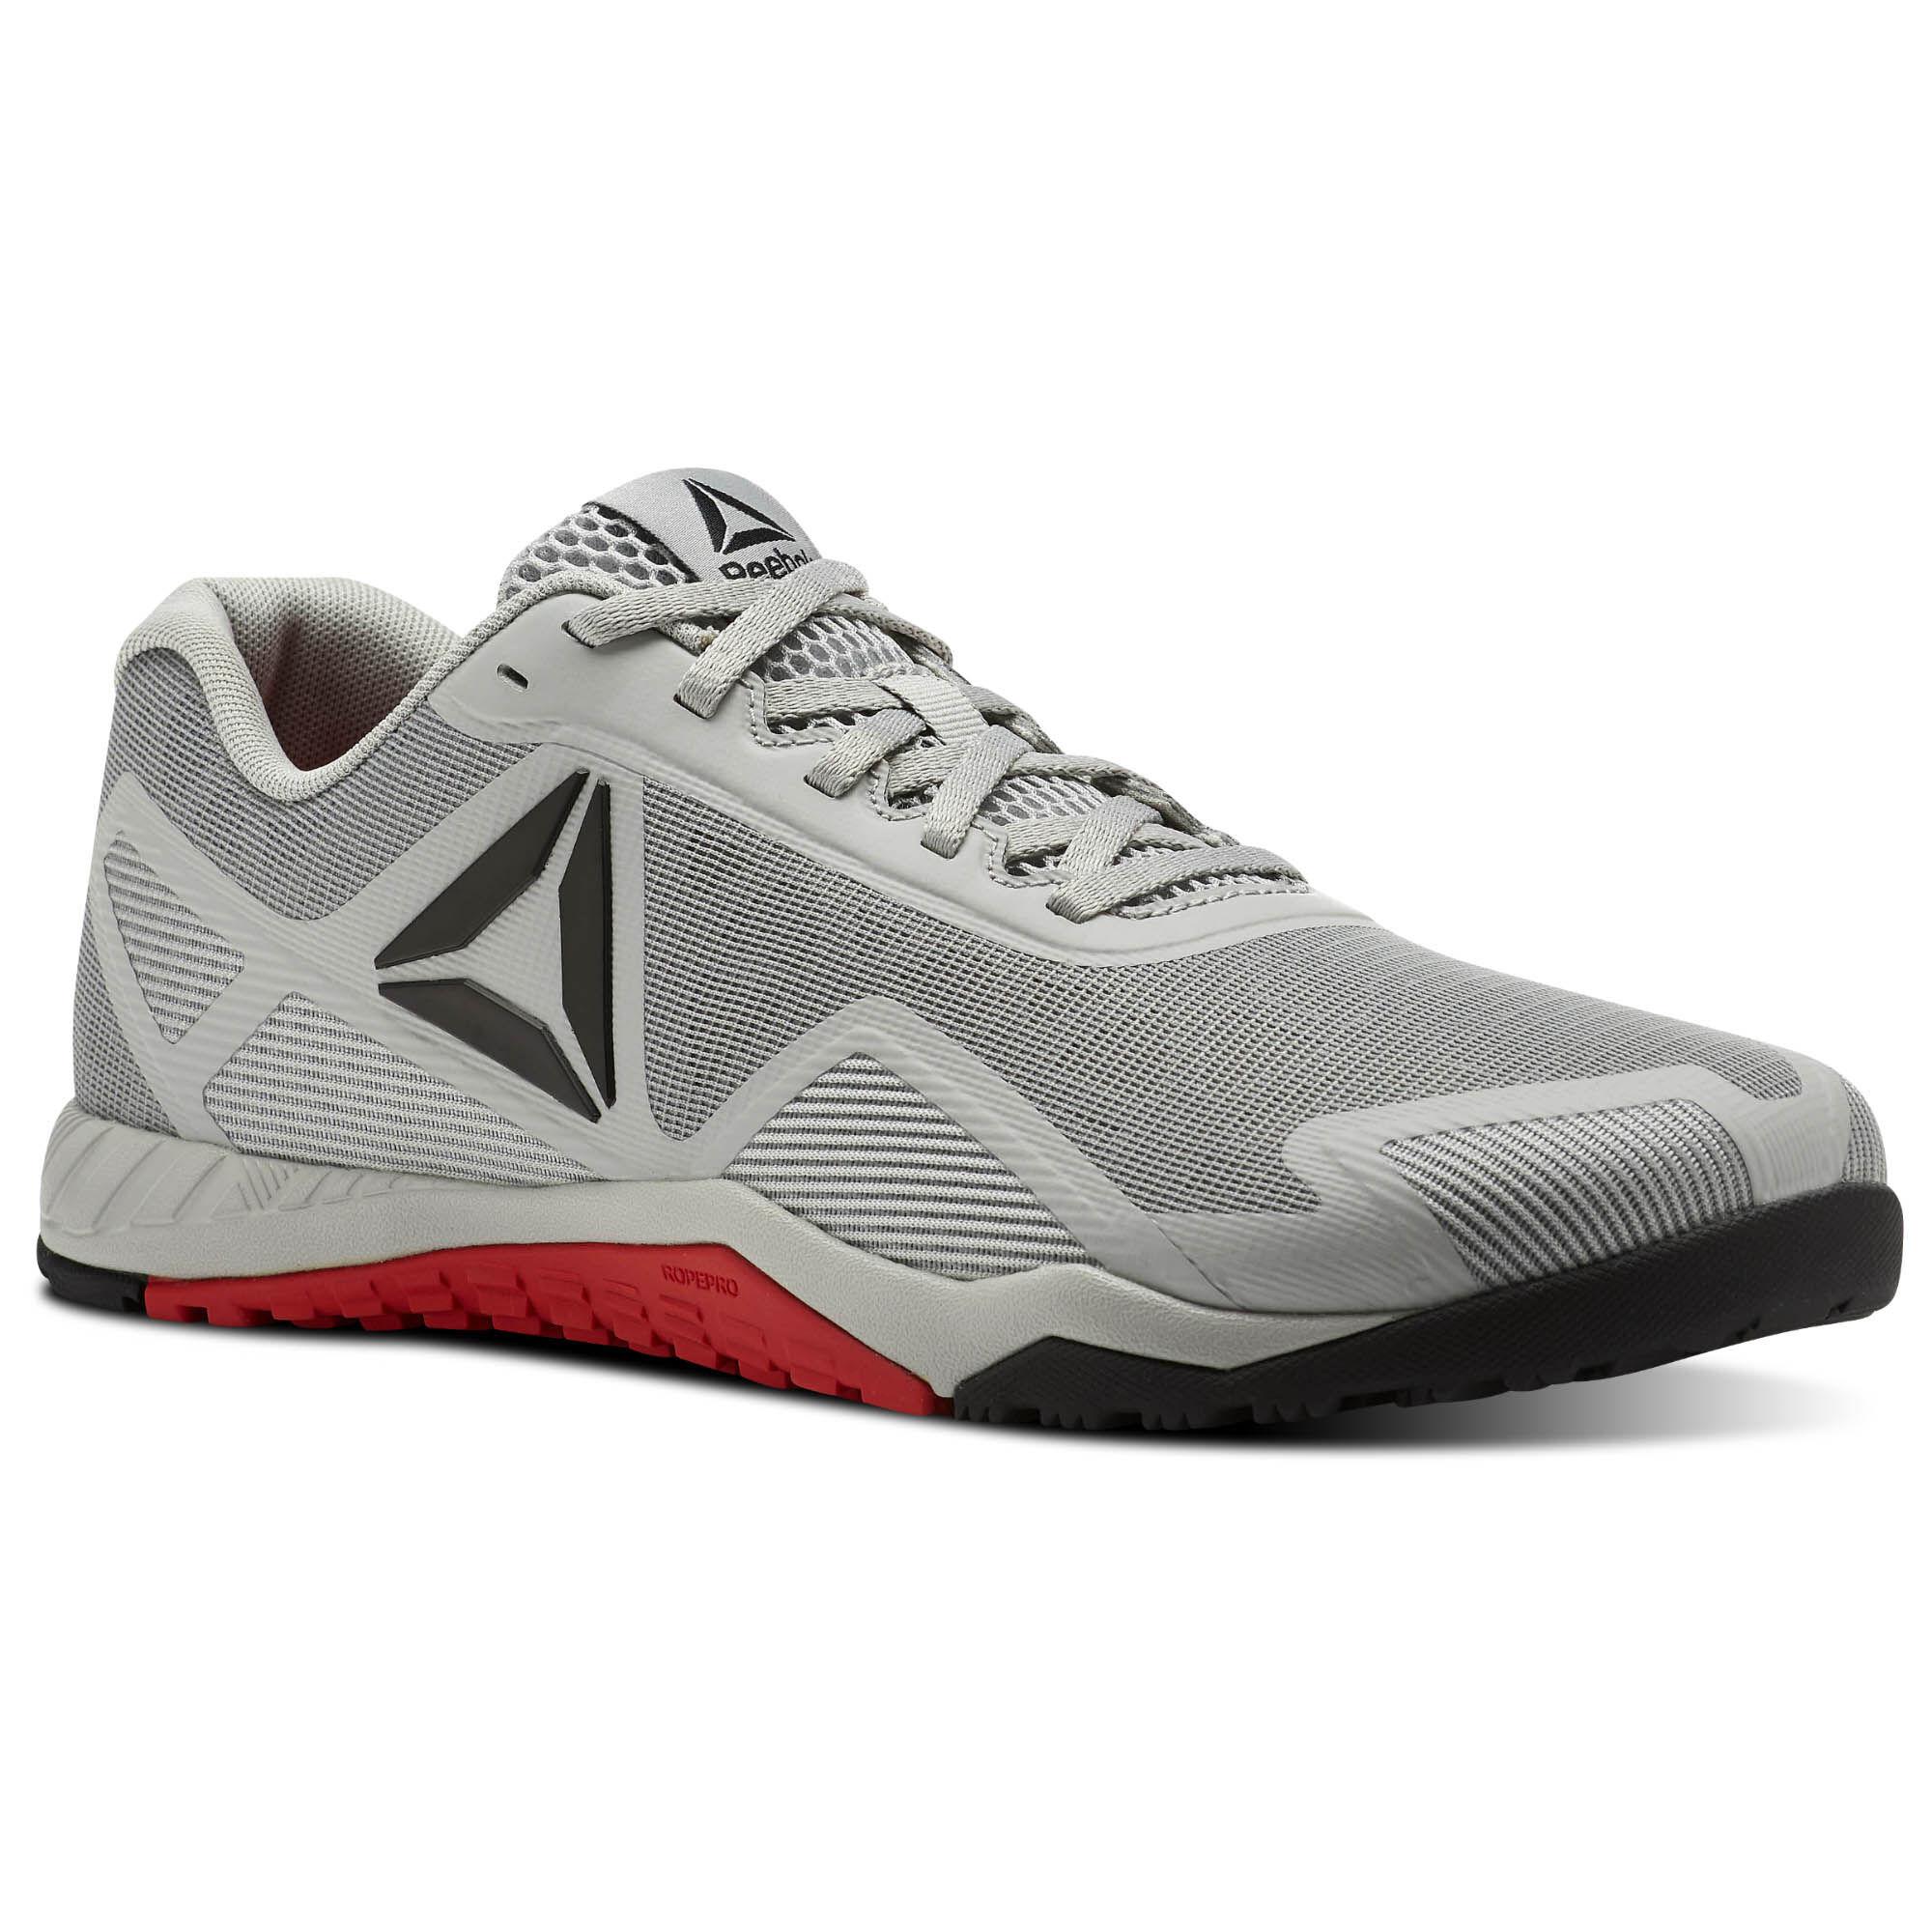 Reebok ROS WORKOUT TR 20  Sports shoes  stark greyredblack   MijXj1xx